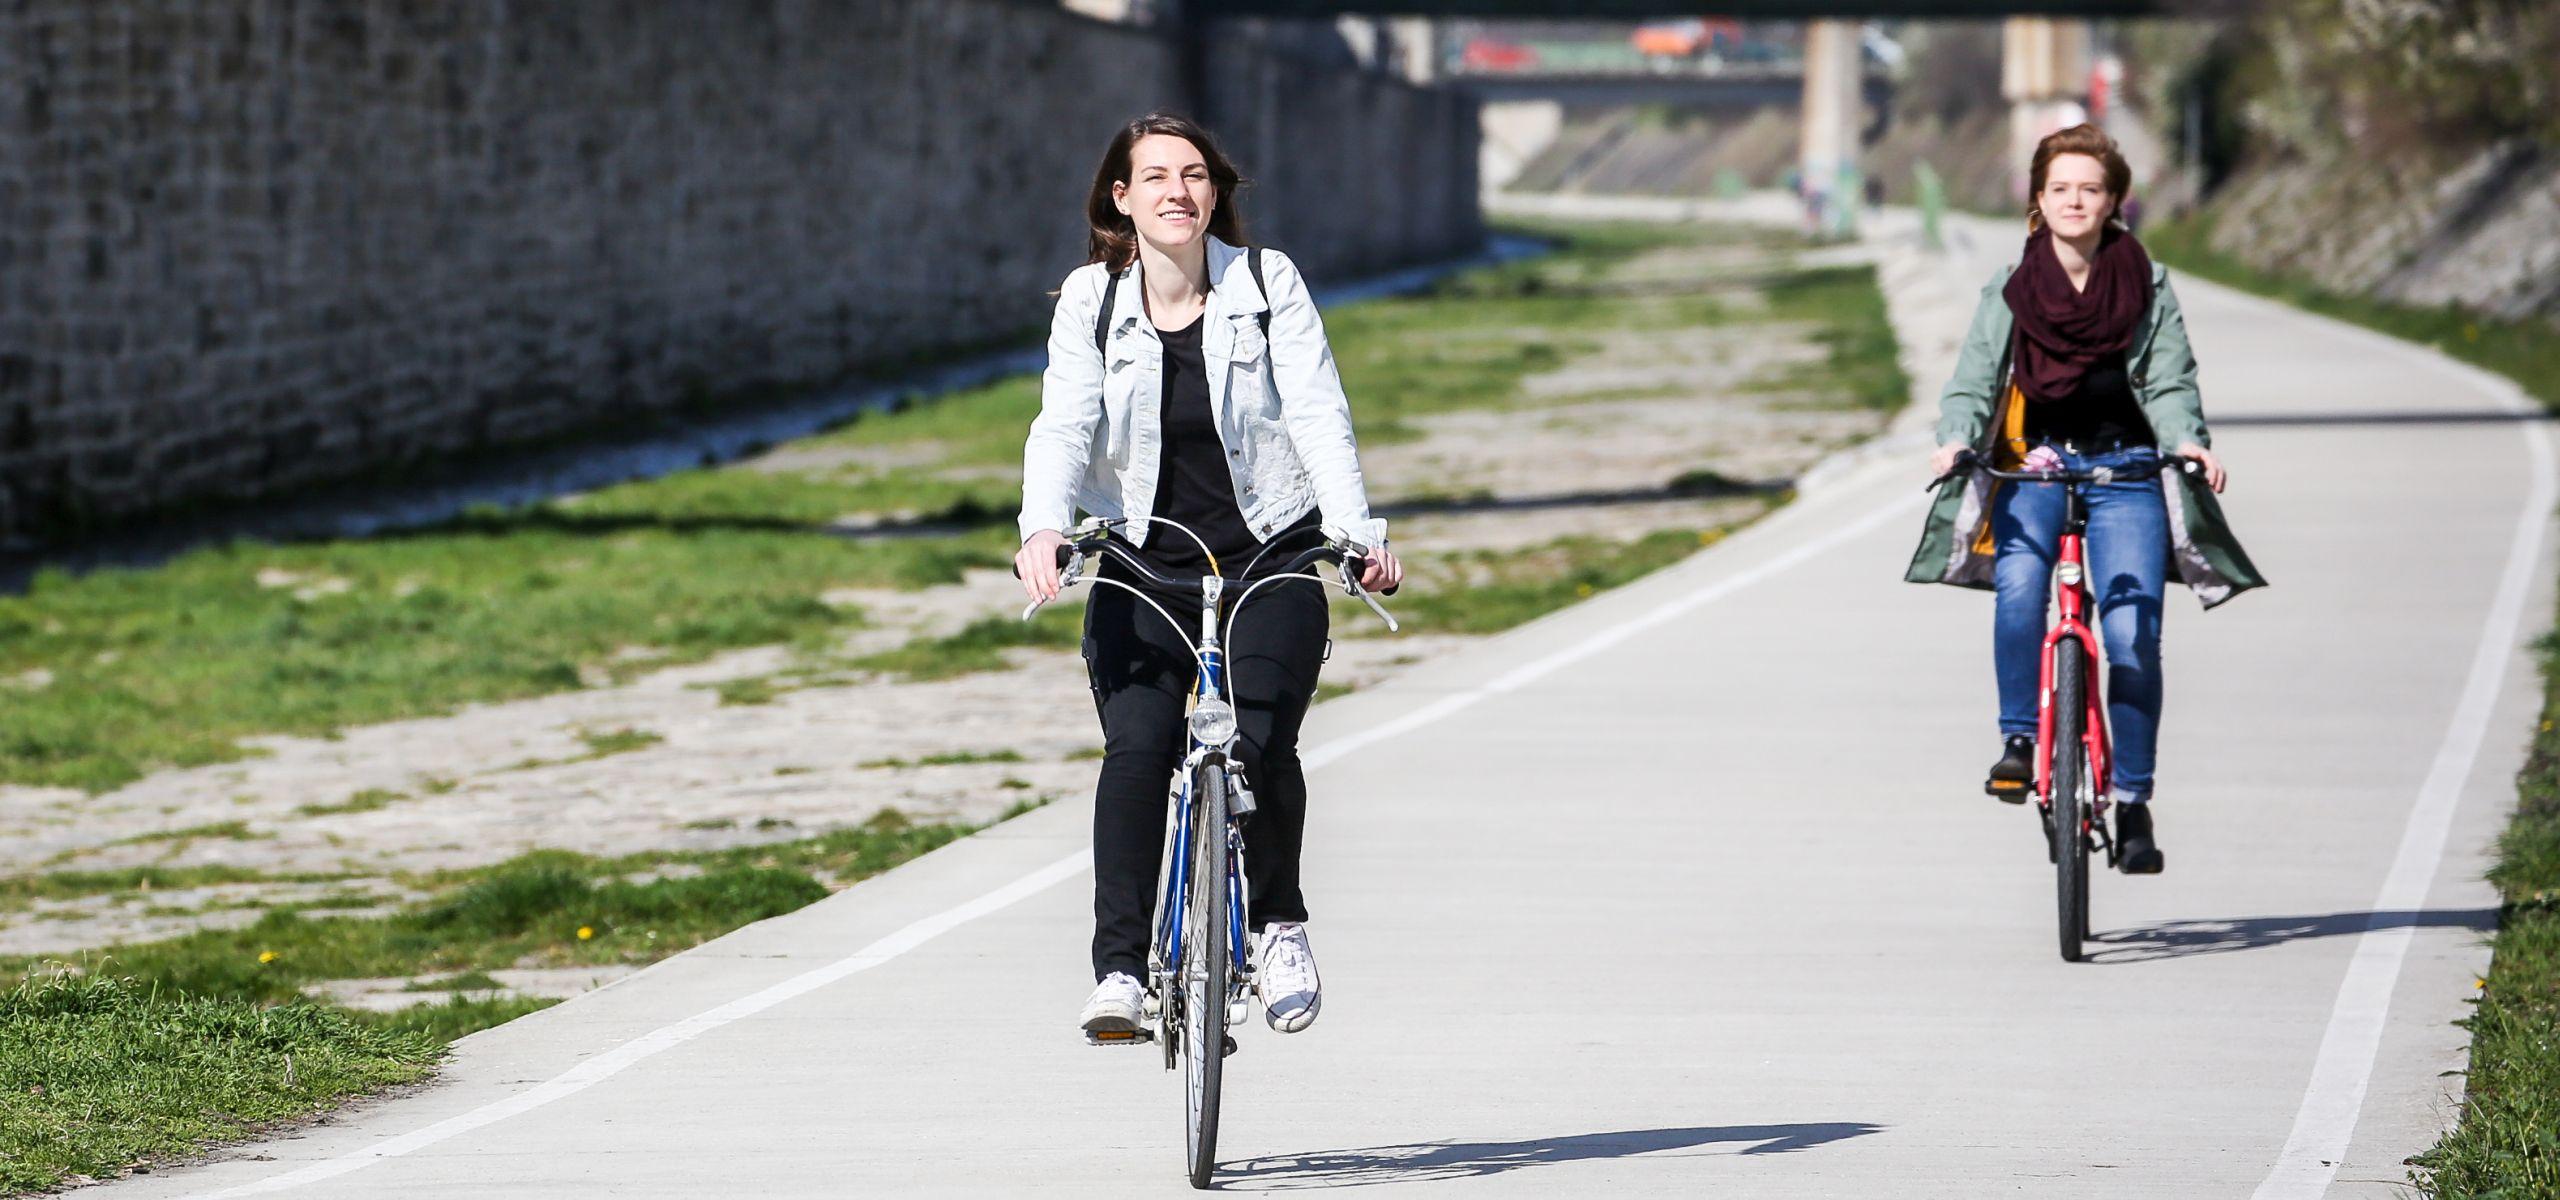 Radfahrerin fährt entlang des Wienfluss Radwegs